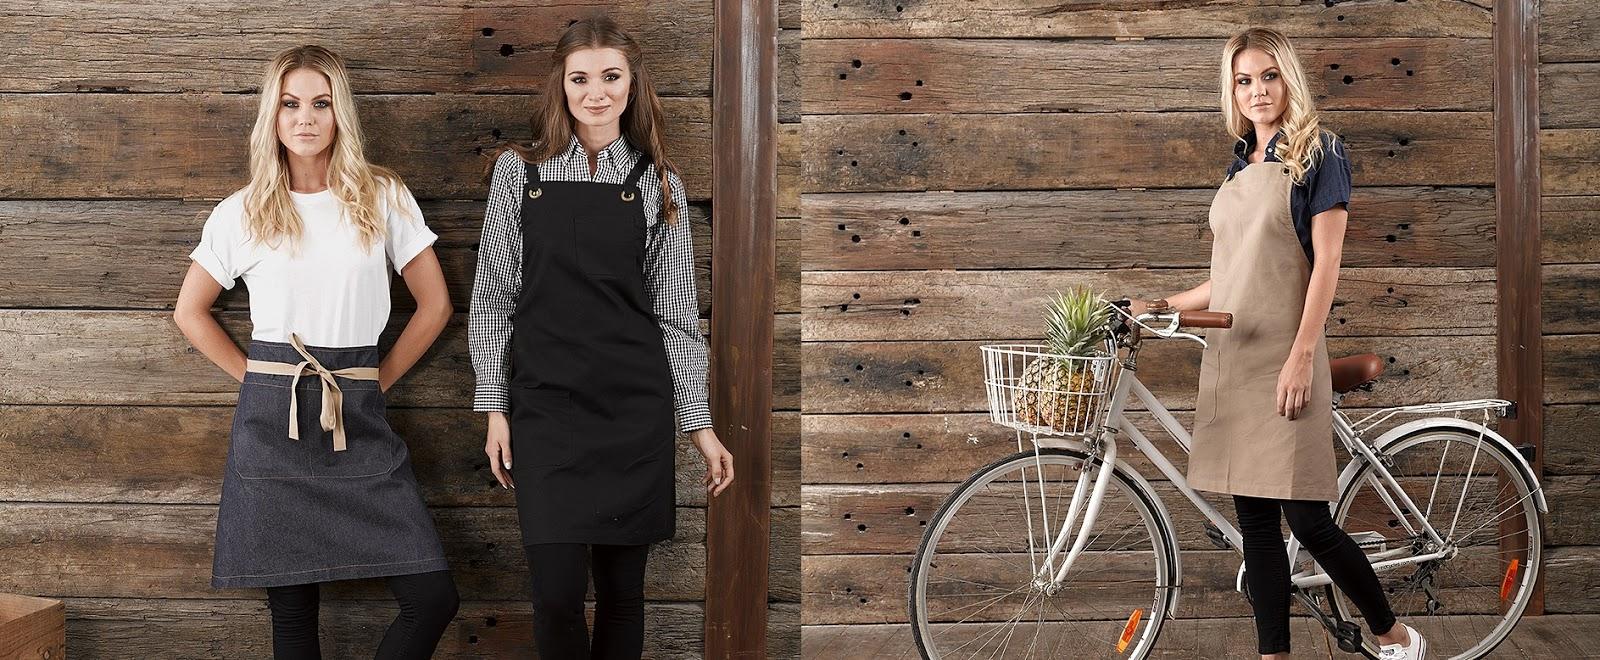 hospitality-uniform